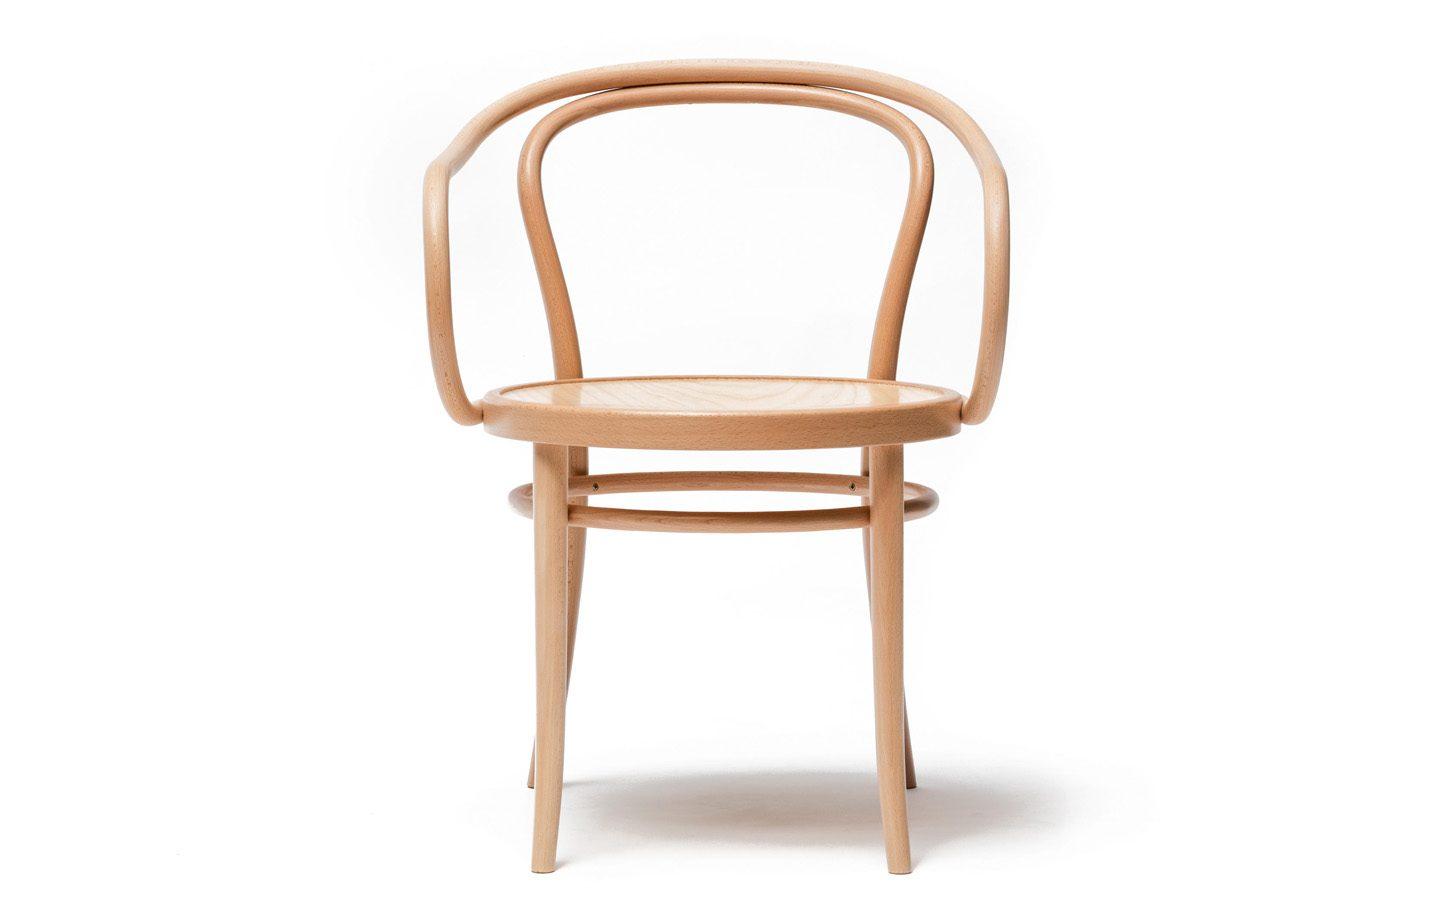 30-Chair-Bent-Wood-Oak-Ton-02